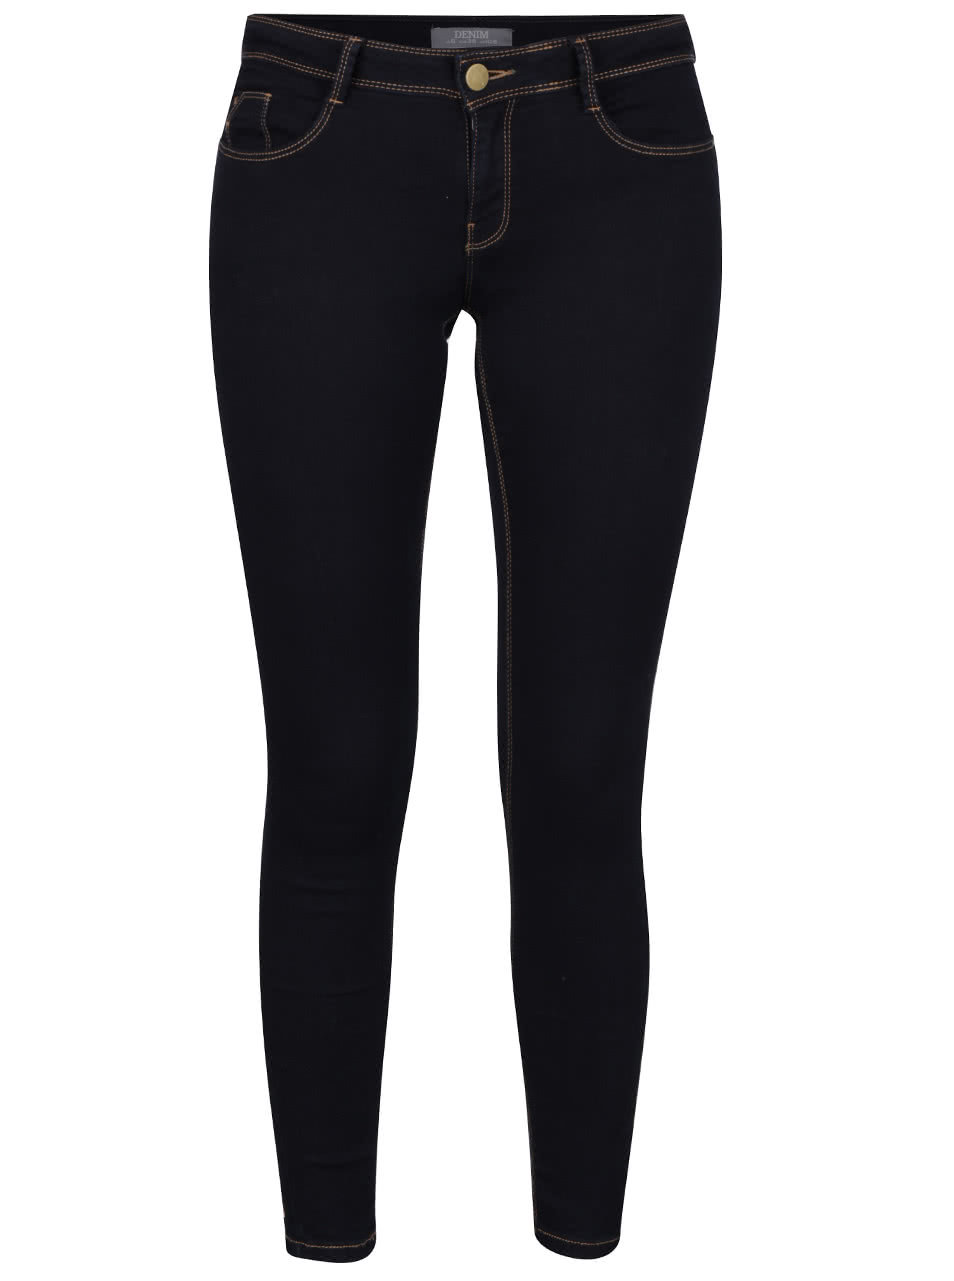 Tmavě modré elastické skinny džíny Dorothy Perkins ... 45b39eca0d